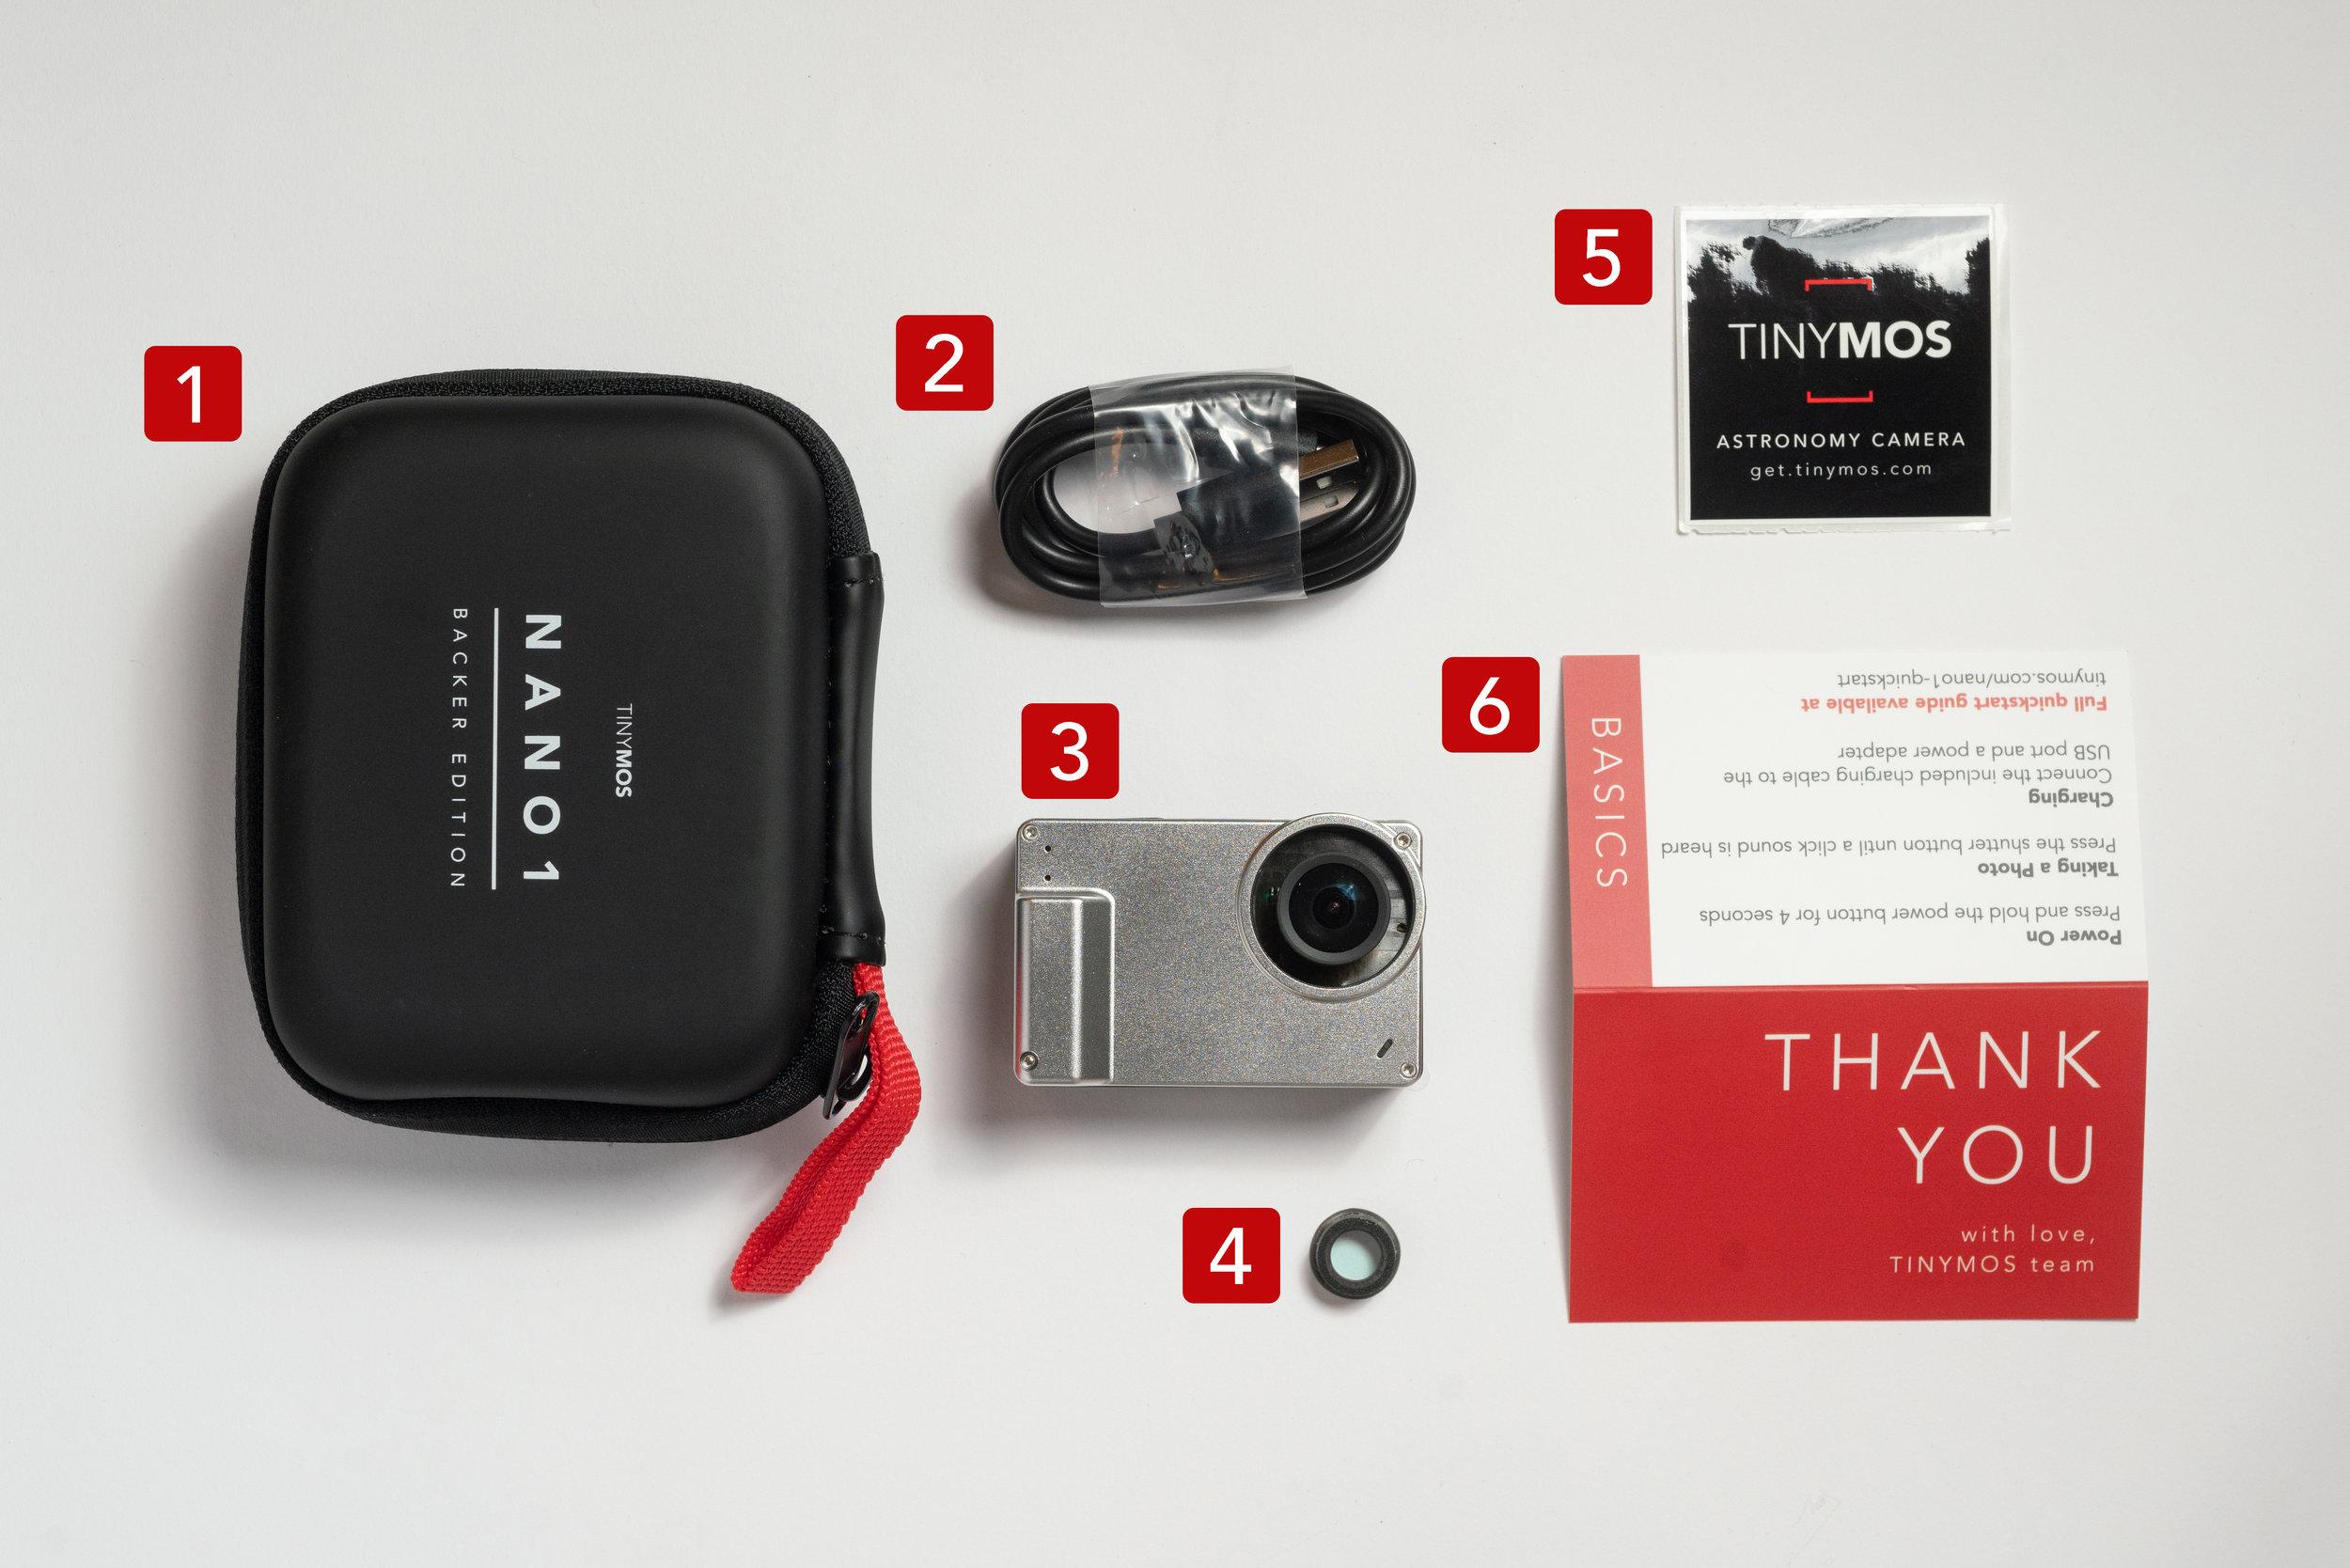 1. NANO1 case | 2. USB-C charging cable | 3. NANO1 Astronomy Camera | 4. IR filter holder | 5. TinyMOS sticker | 6. Welcome & Quickstart Guide